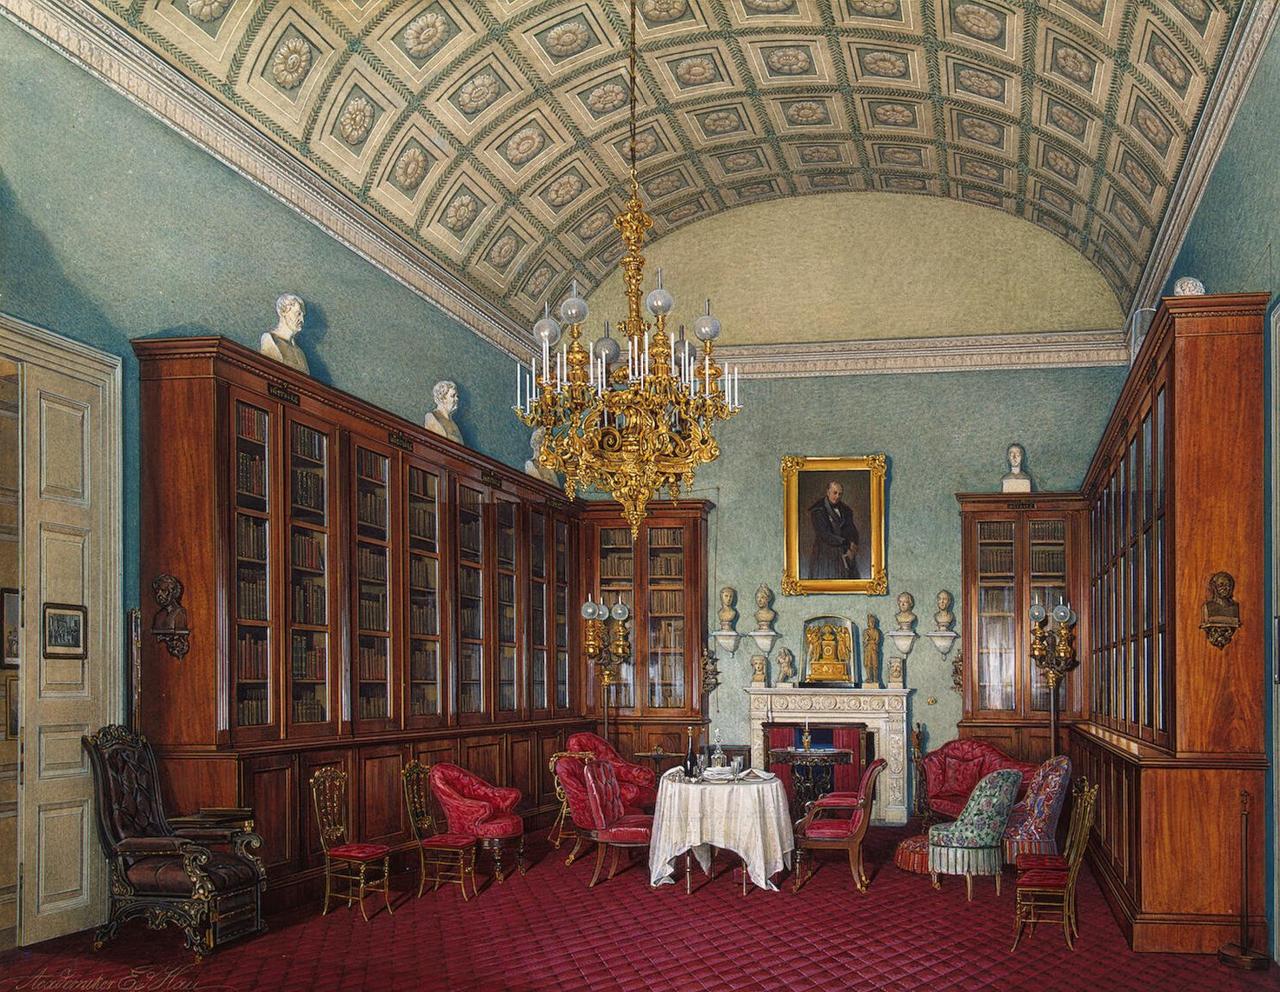 Интерьеры Зимнего дворца. Библиотека императора Александра II